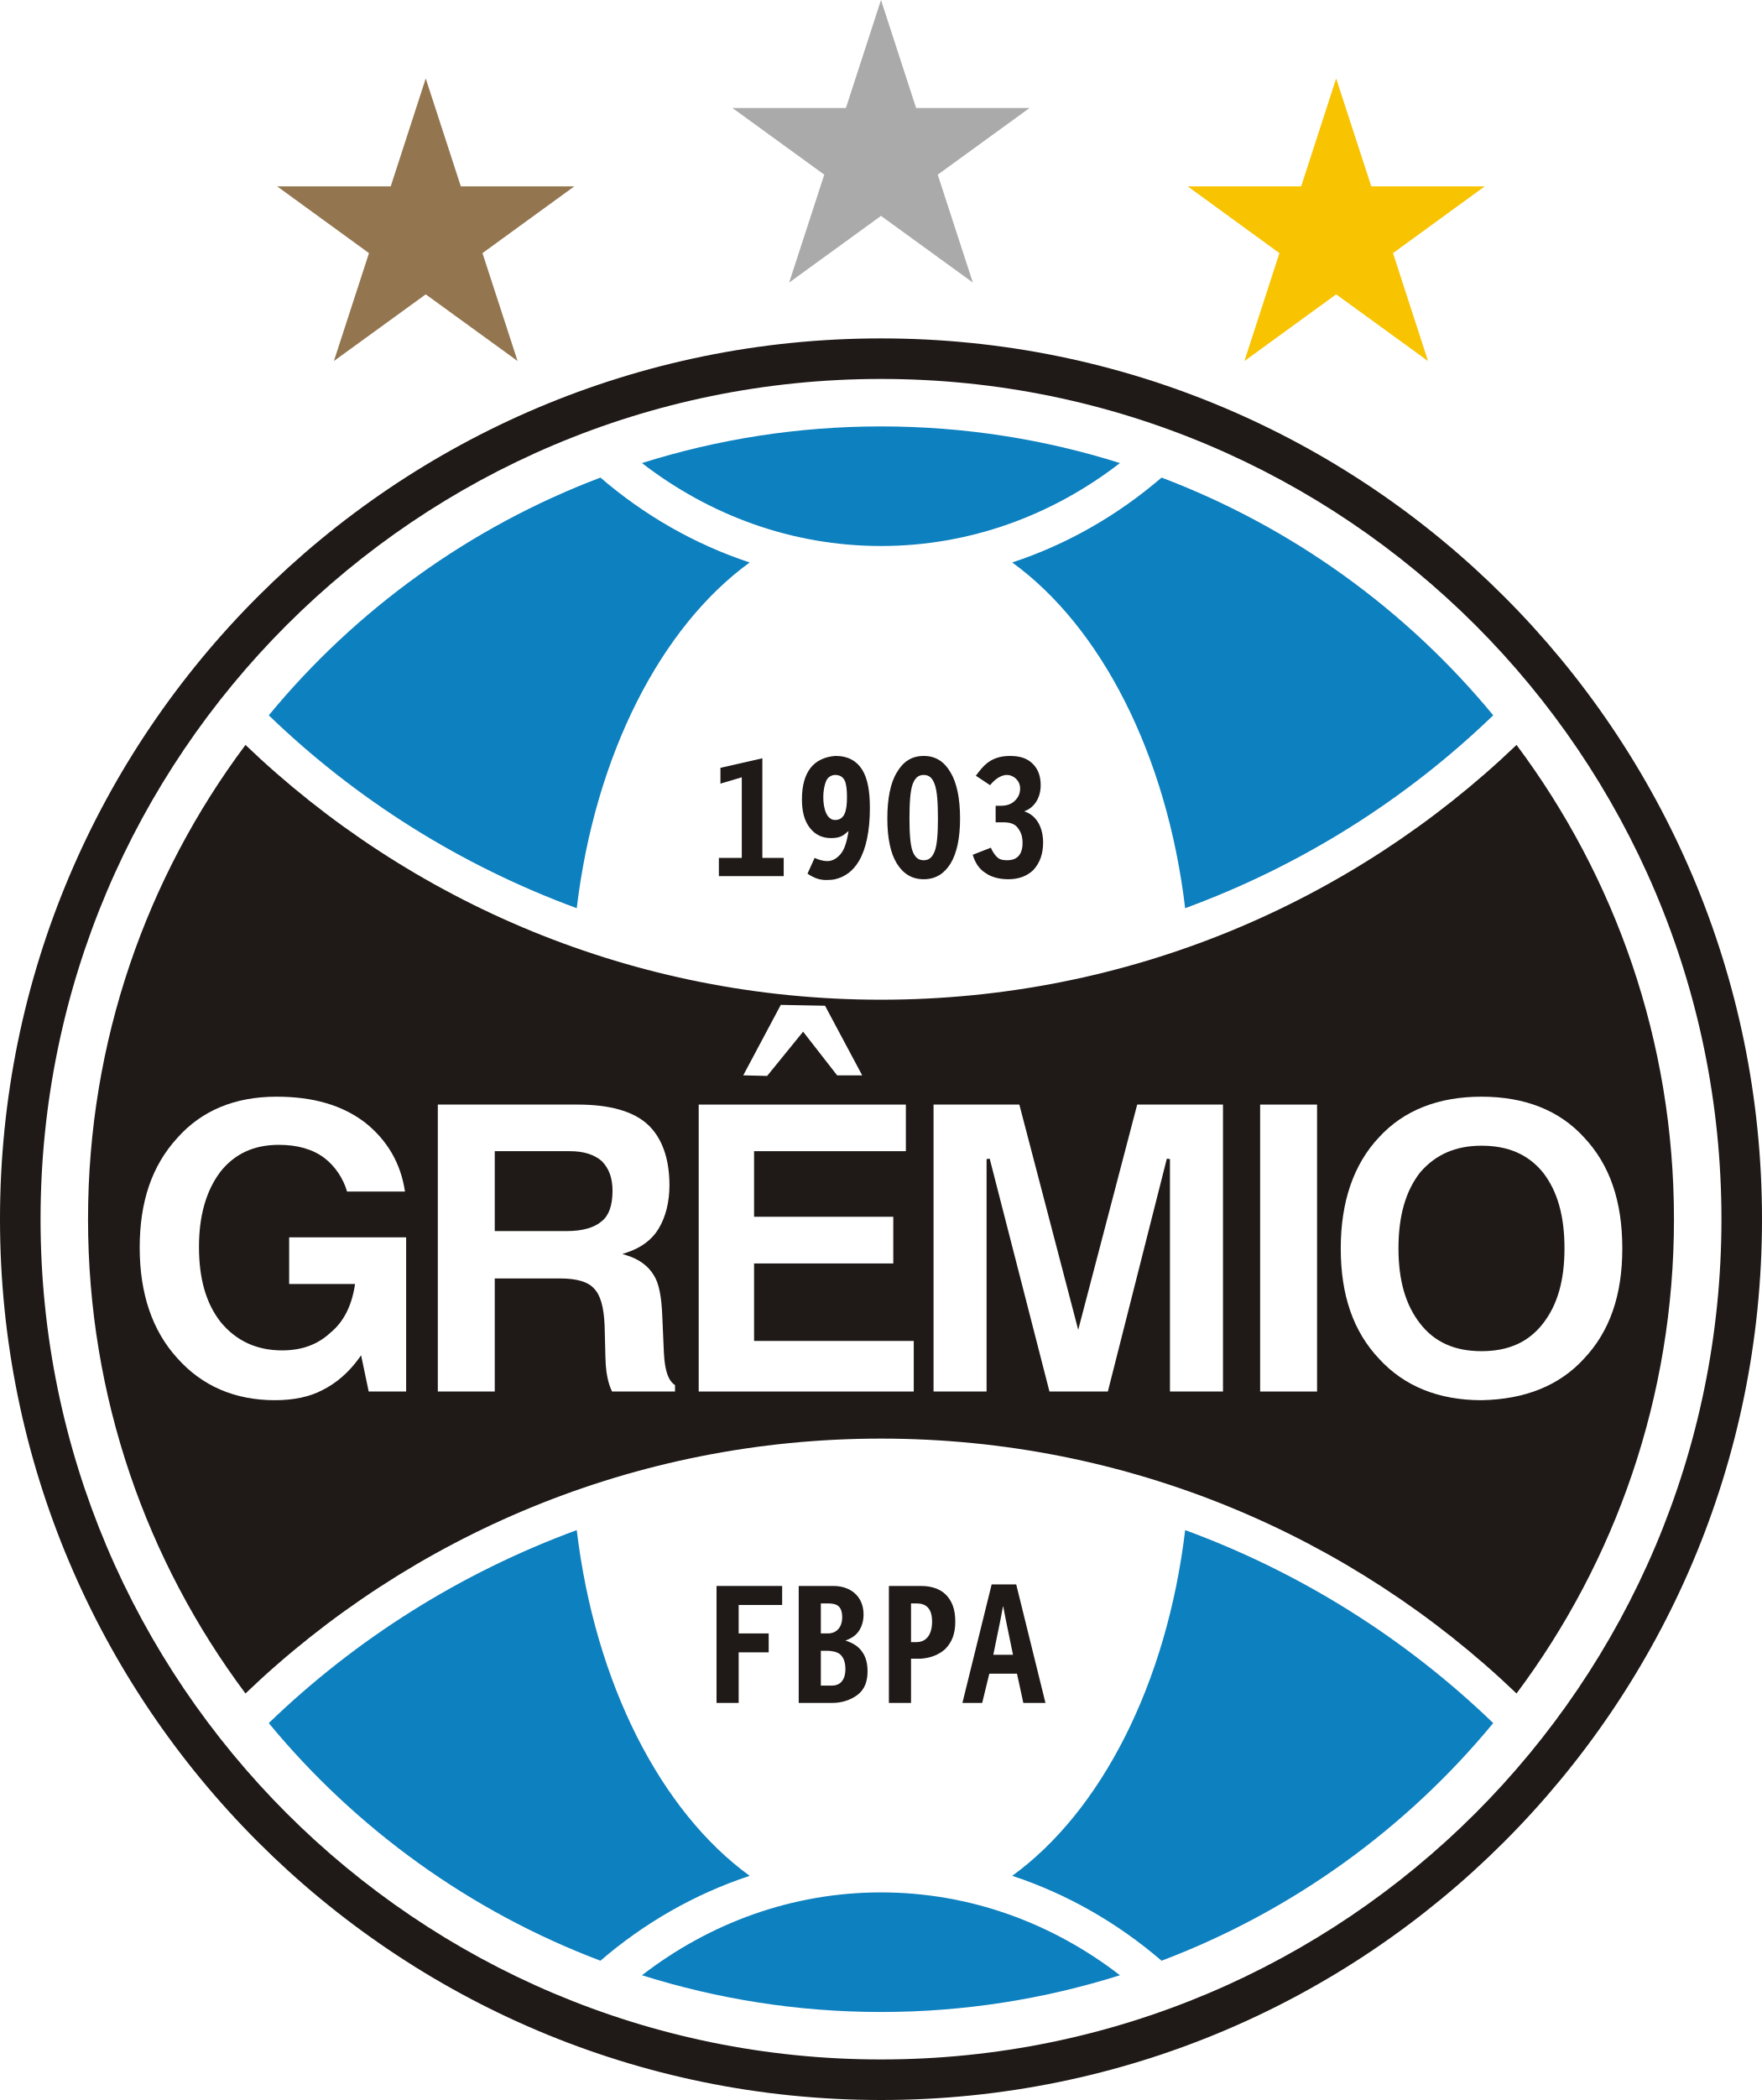 gremio logo escudo 1 - Grêmio Logo - Grêmio Escudo